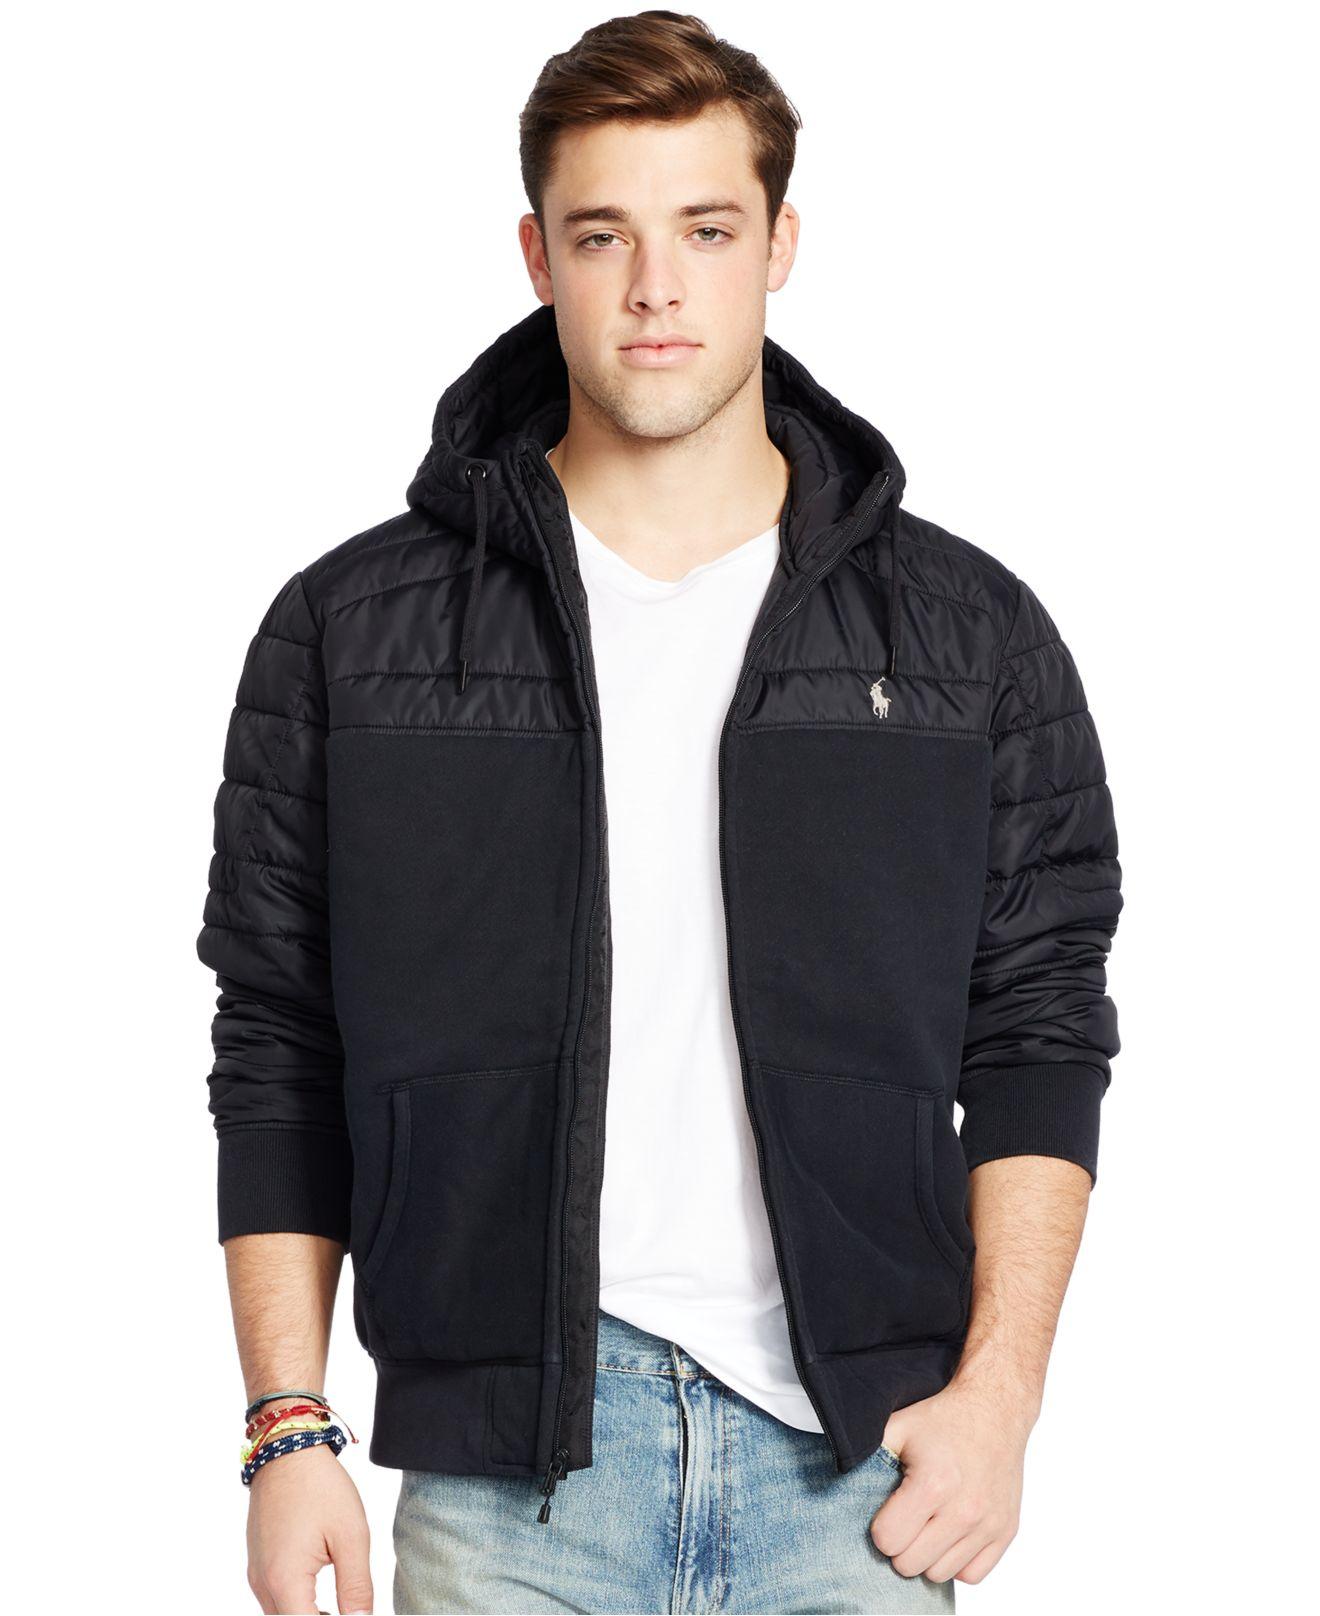 polo ralph lauren quilted fleece hoodie in black for men lyst. Black Bedroom Furniture Sets. Home Design Ideas